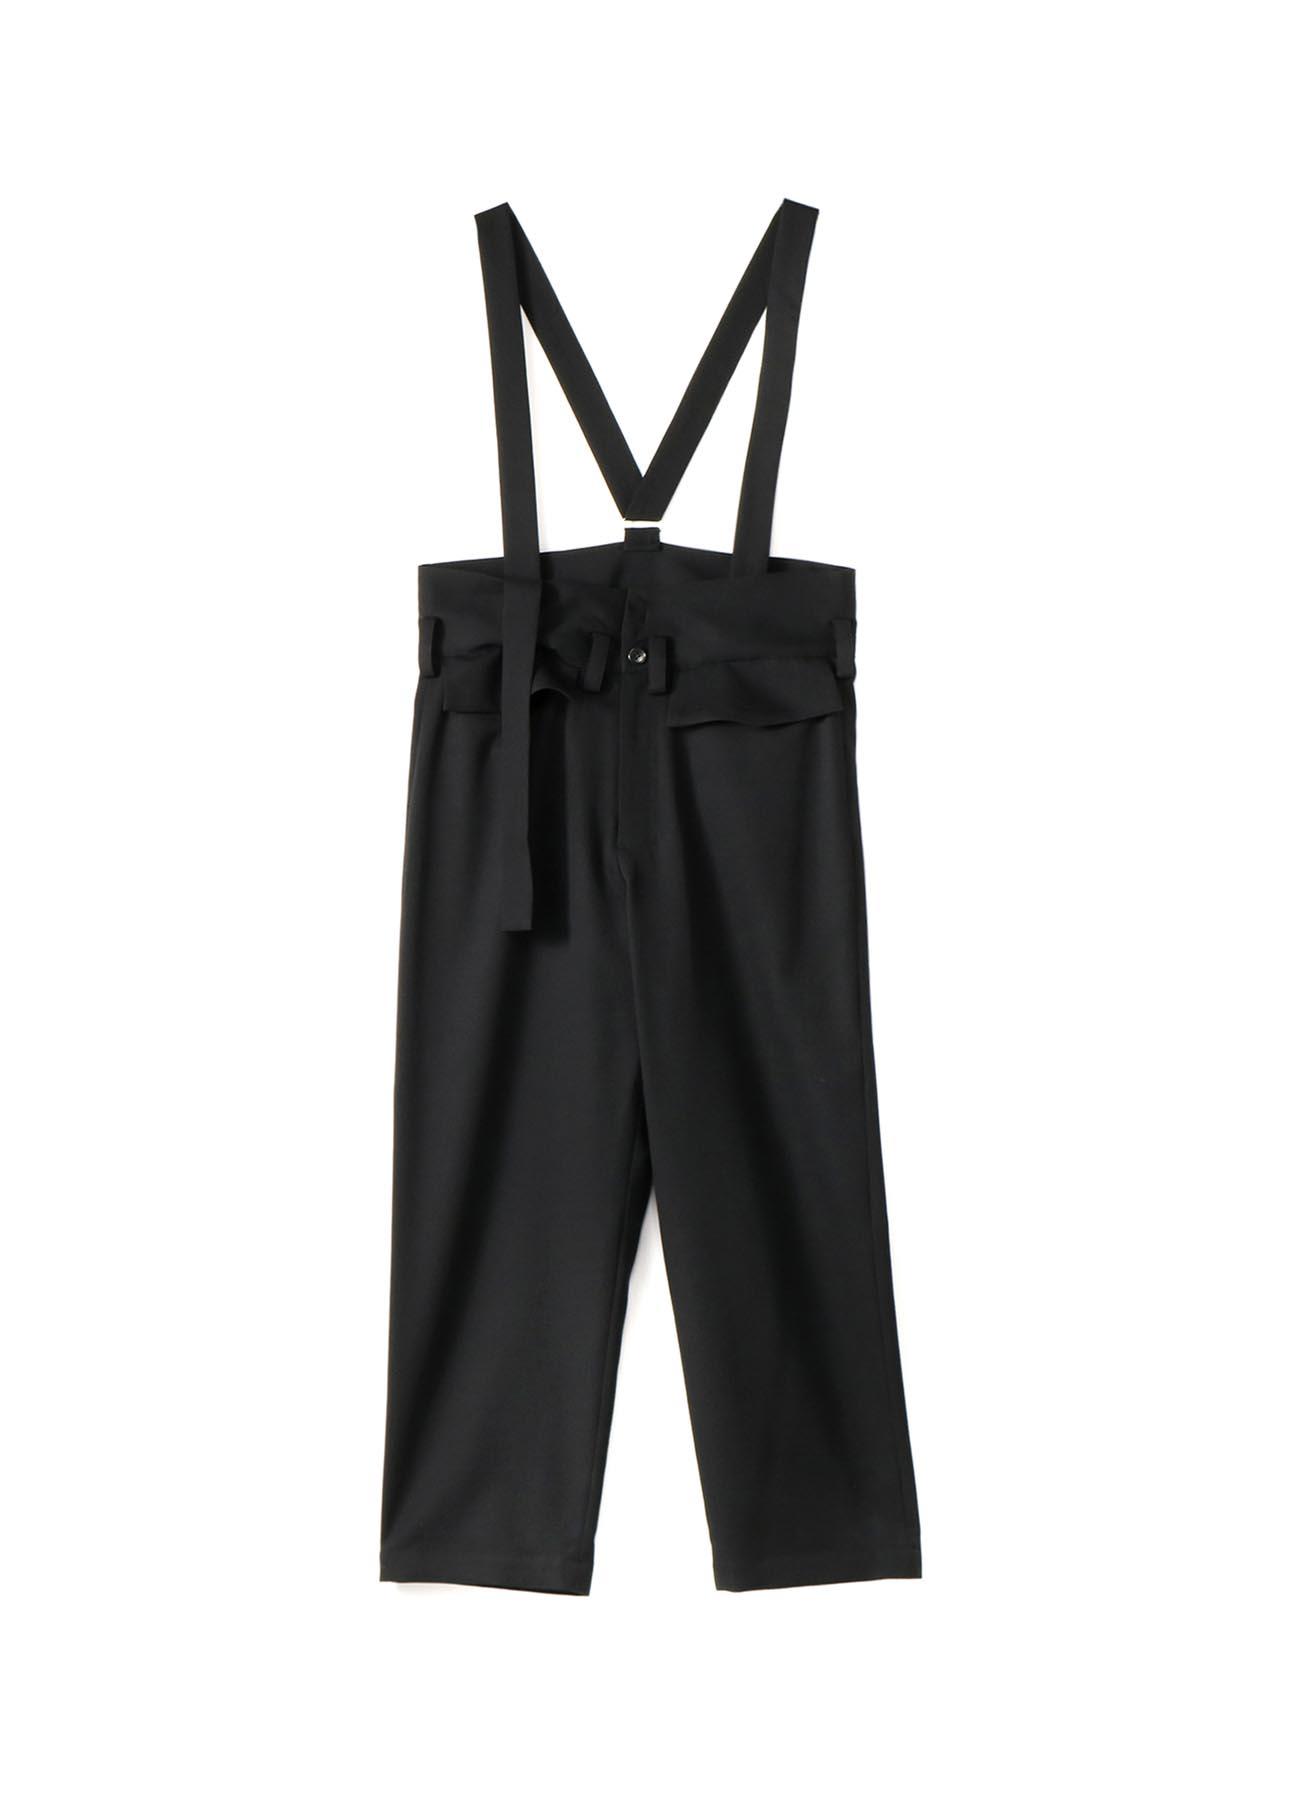 W/Gabardine Hanging Pants